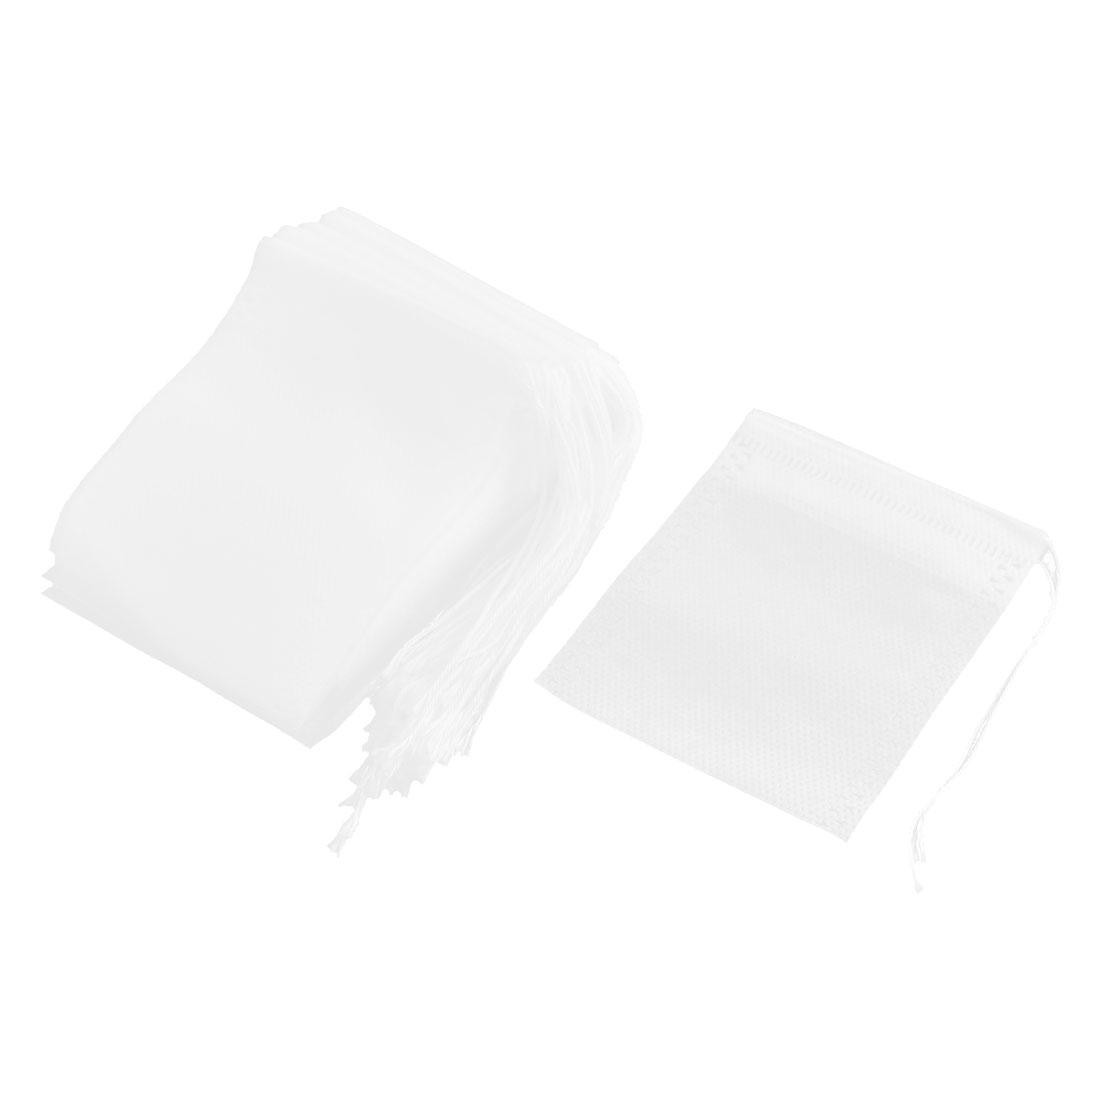 Home Non-woven Fabric Empty Herbal Powder Spice Tea Filter Bag White 9cm x 7cm 50 Pcs